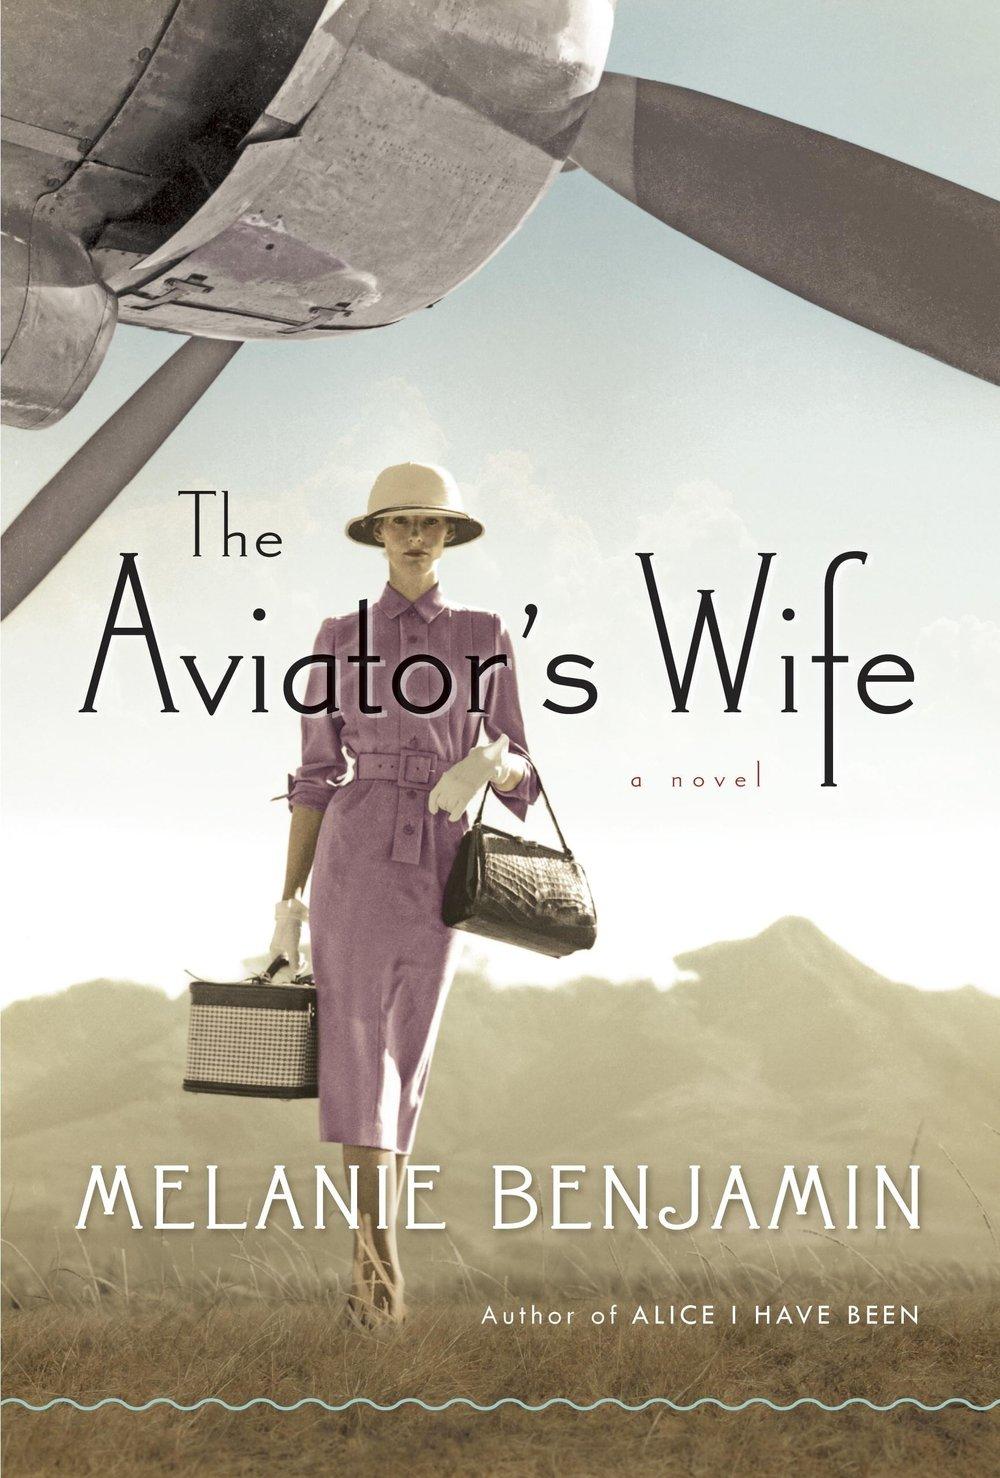 The Aviator's Wife by Melanie Benjamin.jpeg